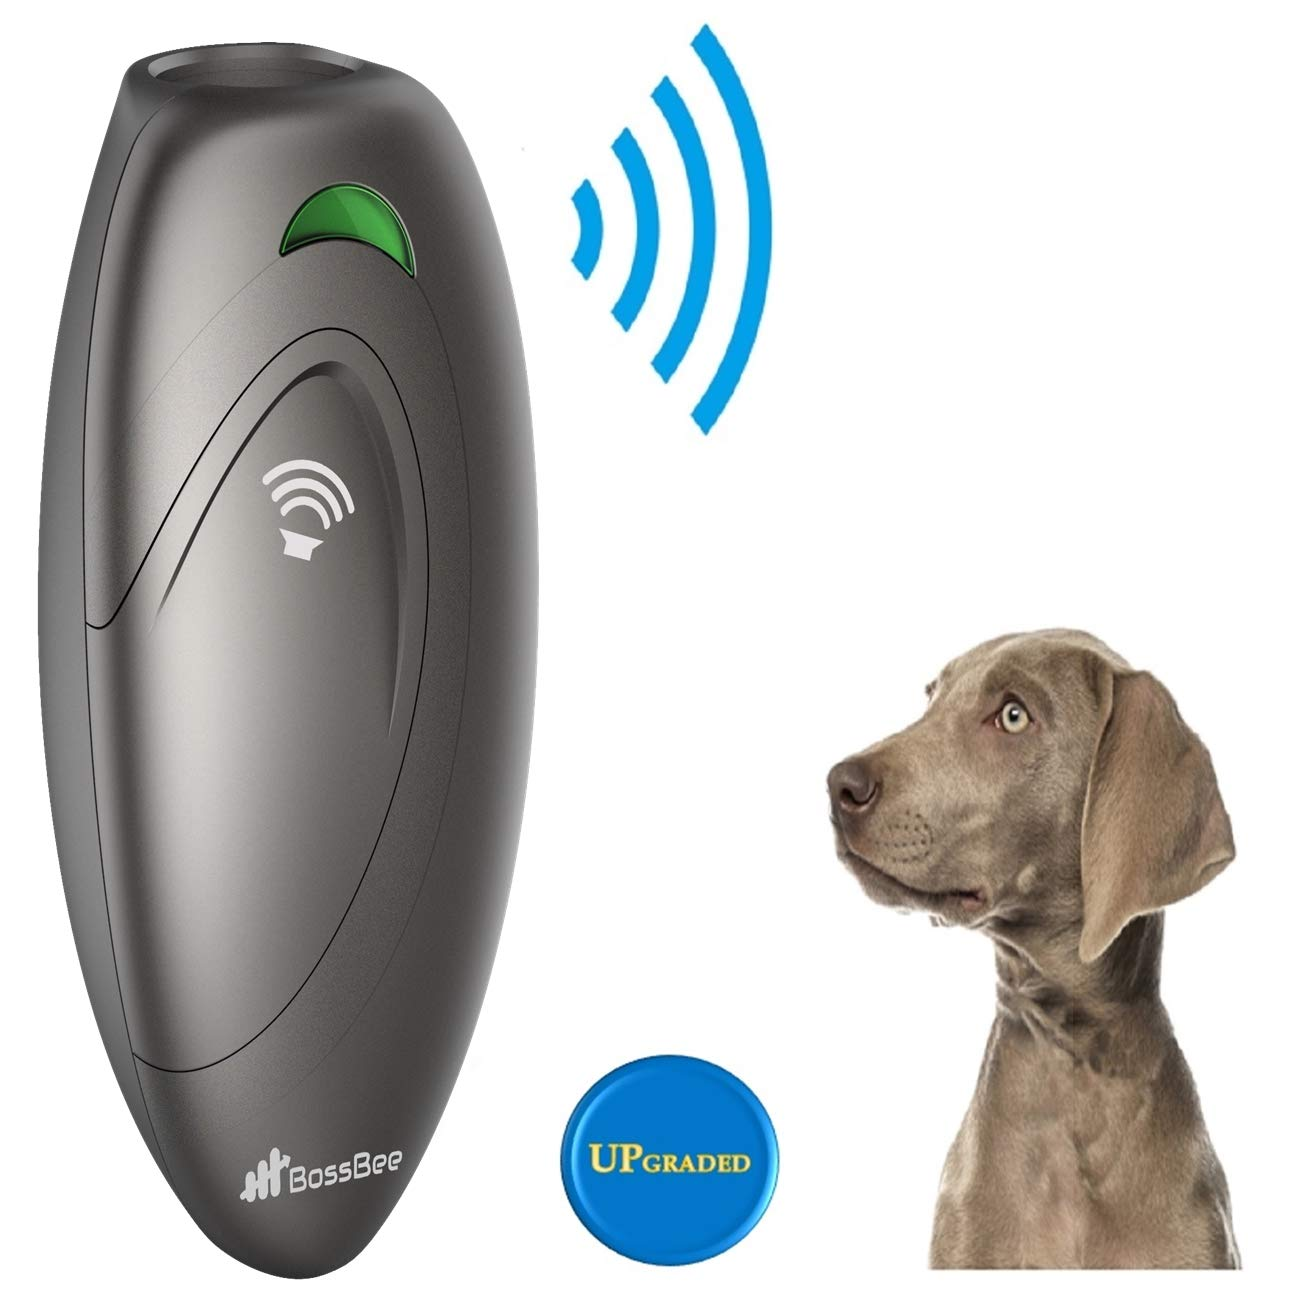 BossBee Ultrasonic barking control, Dog bark control, Bark trainer, Anti  barking device, Handheld ultrasonic dog bark deterrent with Wrist Strap,No